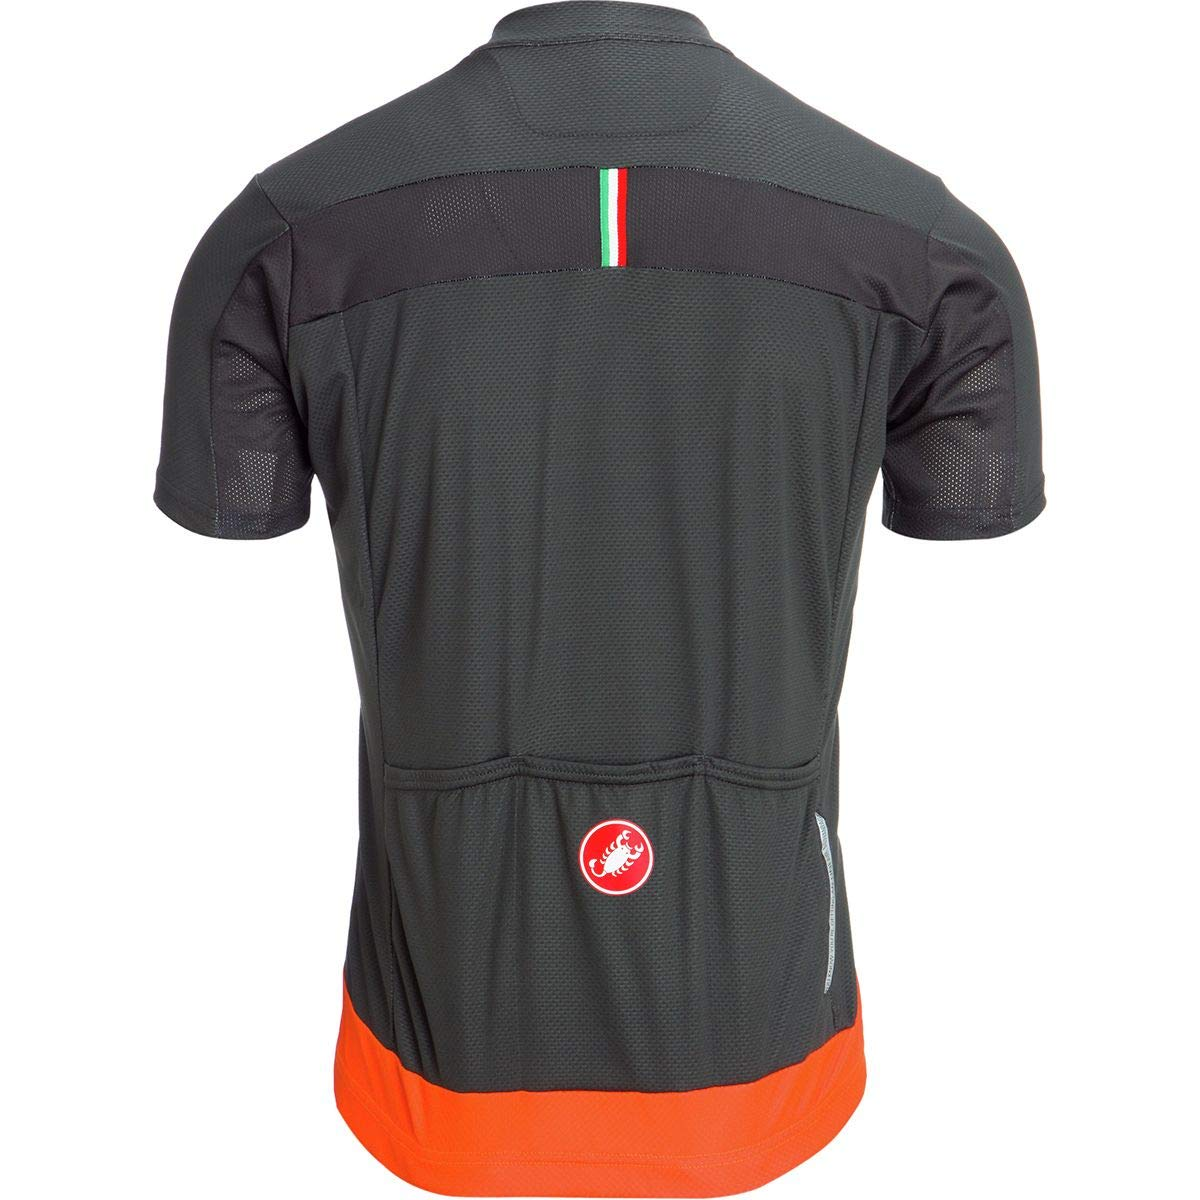 67d45e260 Amazon.com   Castelli Prologo V Limited Edition Jersey - Men s   Sports    Outdoors